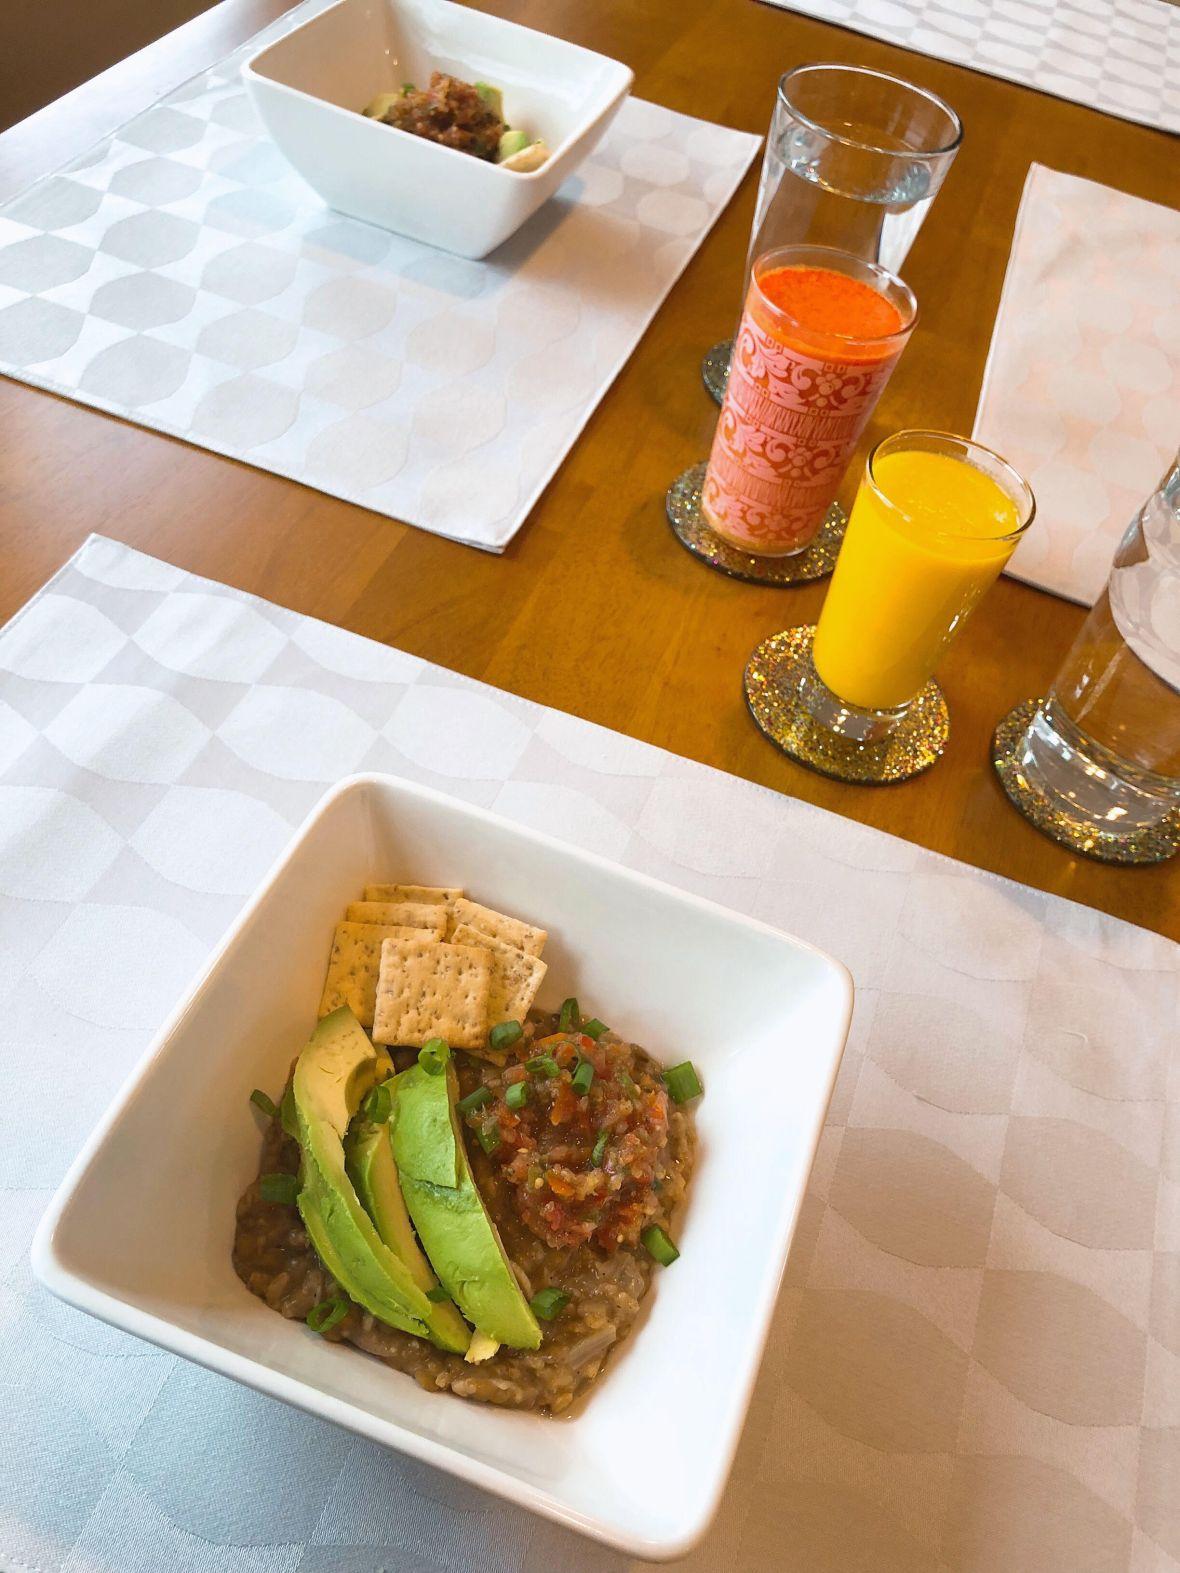 Oatmeal & Lentil Bowl Insta